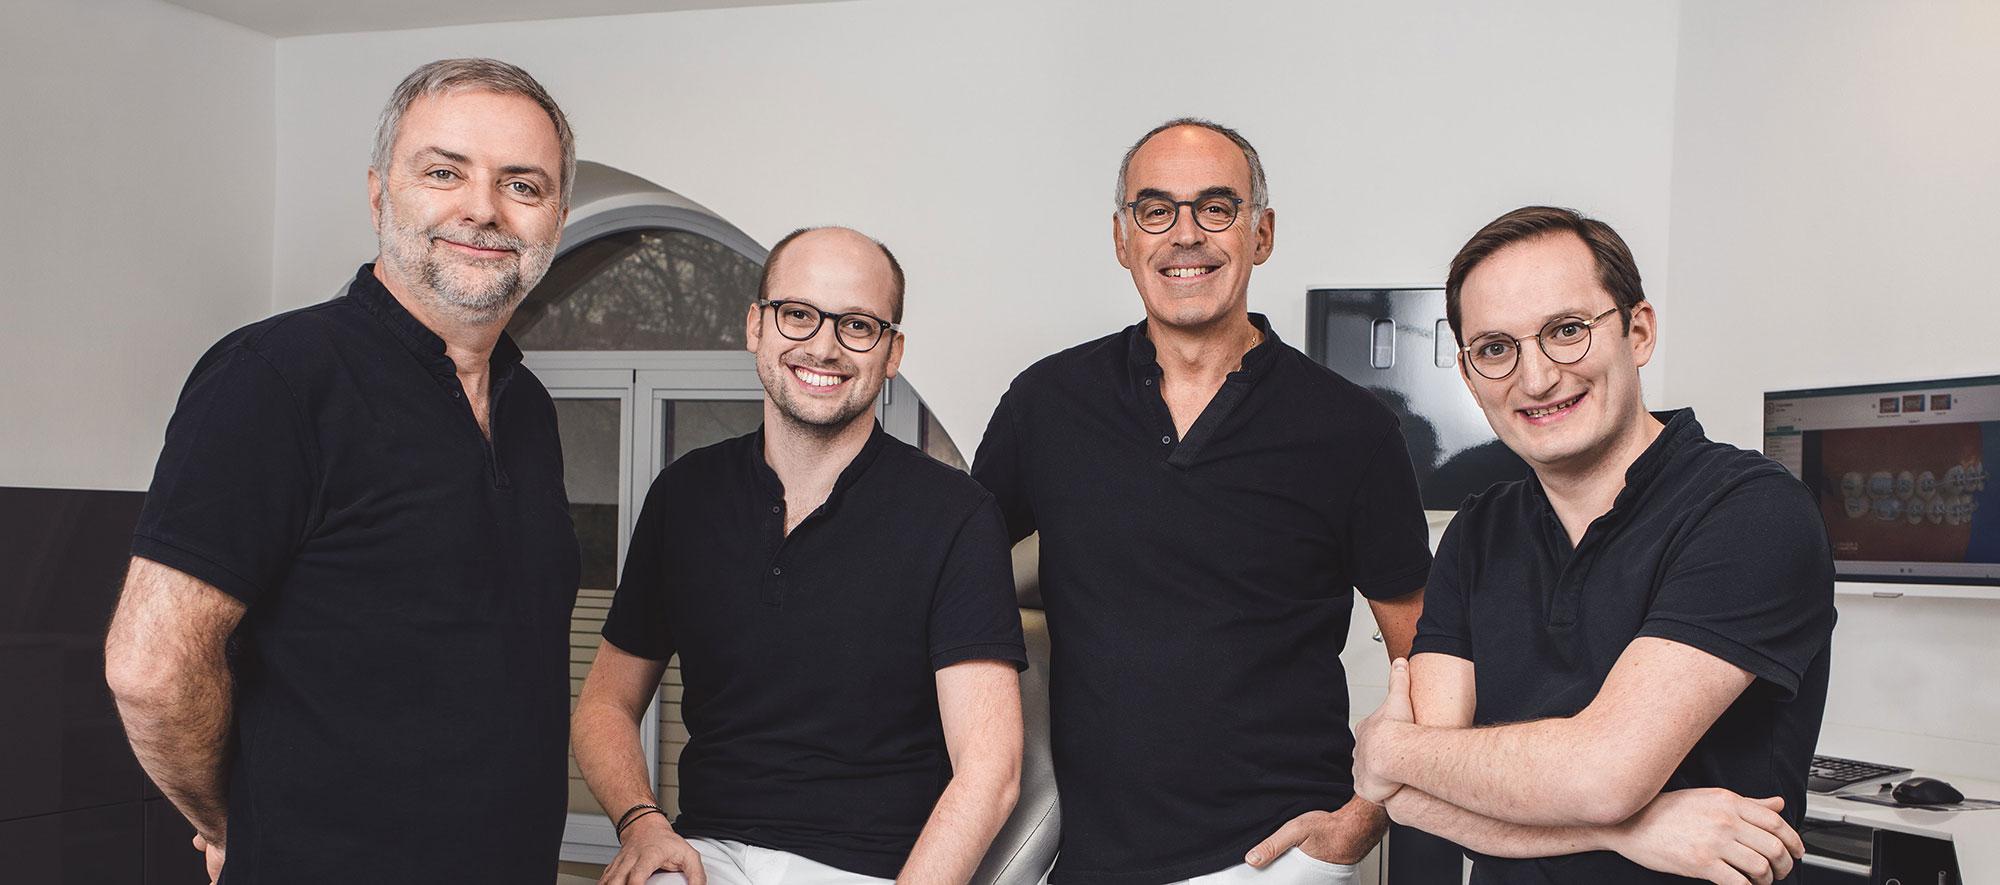 Cabinet d'orthodontie Serpenoise - Docteurs Marie, terrasse, Marjenberg et Simon